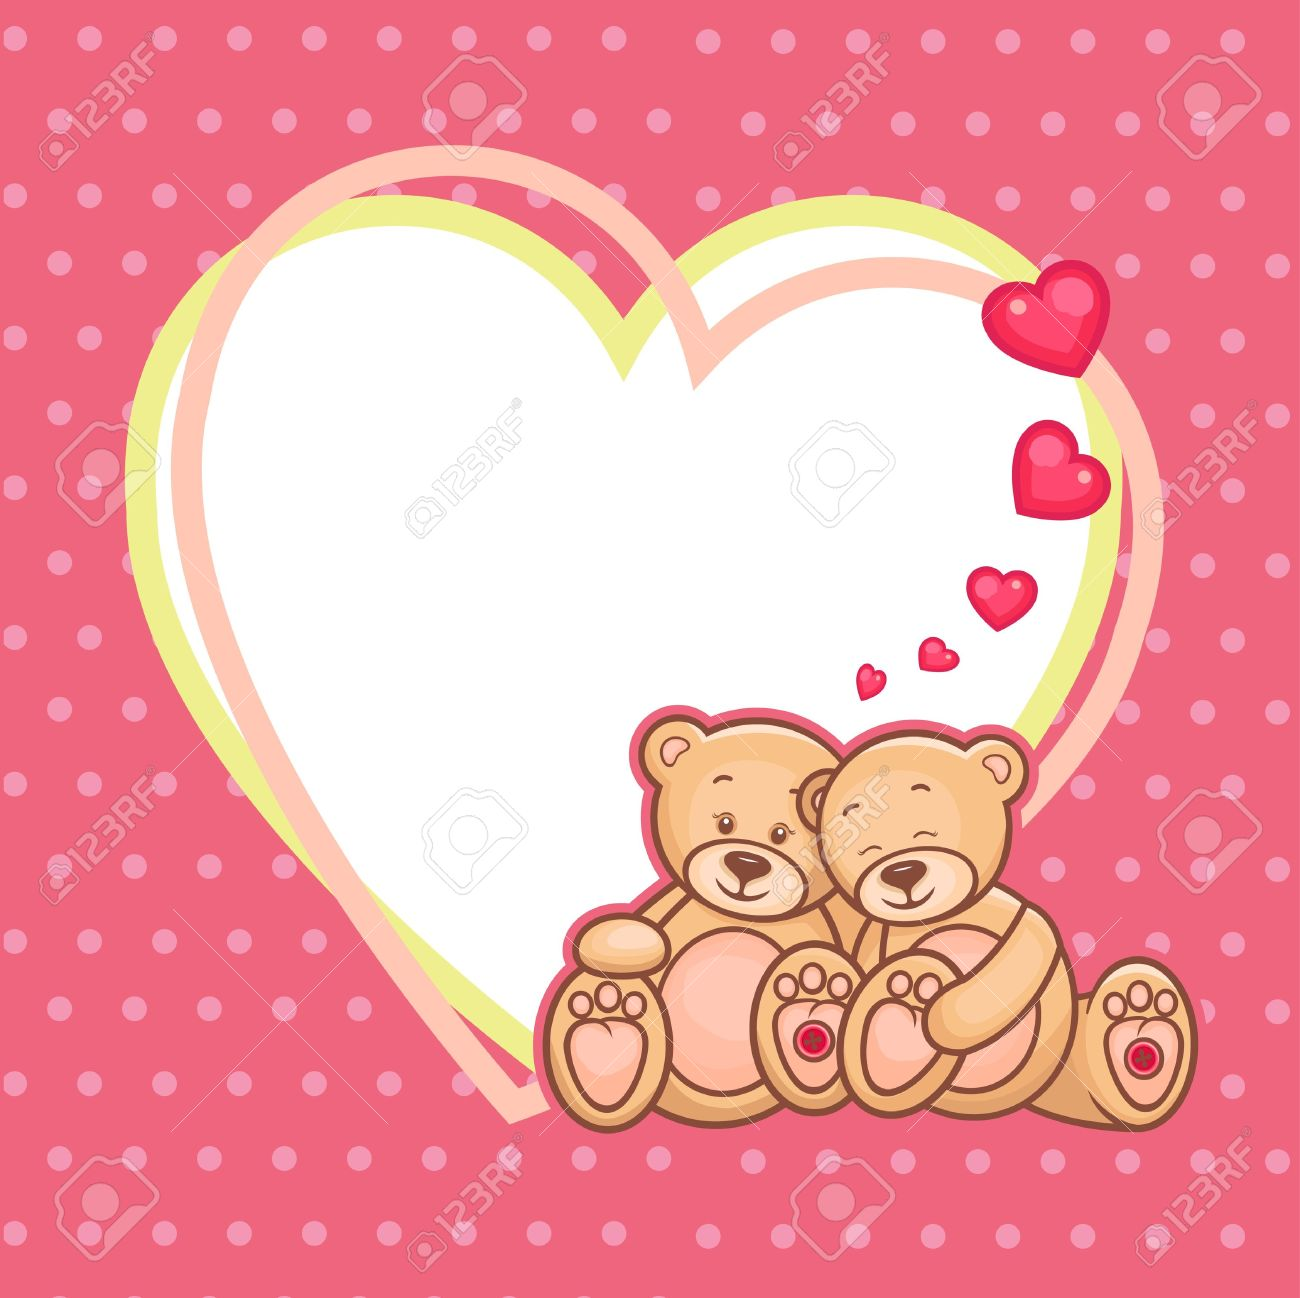 Cute Teddy Bears And Big Heart, Illustration Stock Vector   18621429